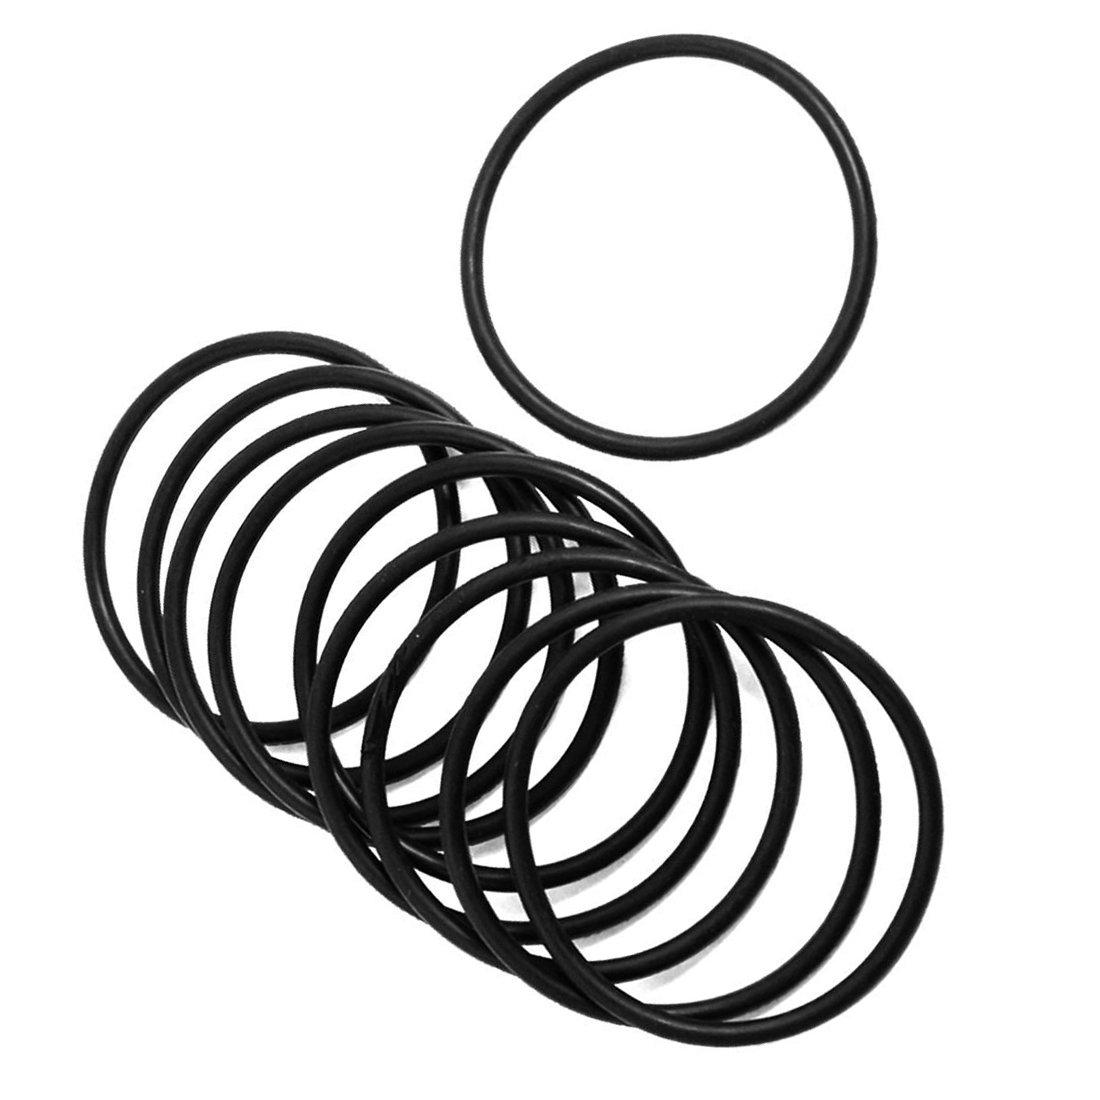 10 PCS Schwarz Gummi Oil Seal O-Ring Dichtung Unterlegscheiben 38x3x32mm O-Ring Dichtung Unterlegscheiben TOOGOO R